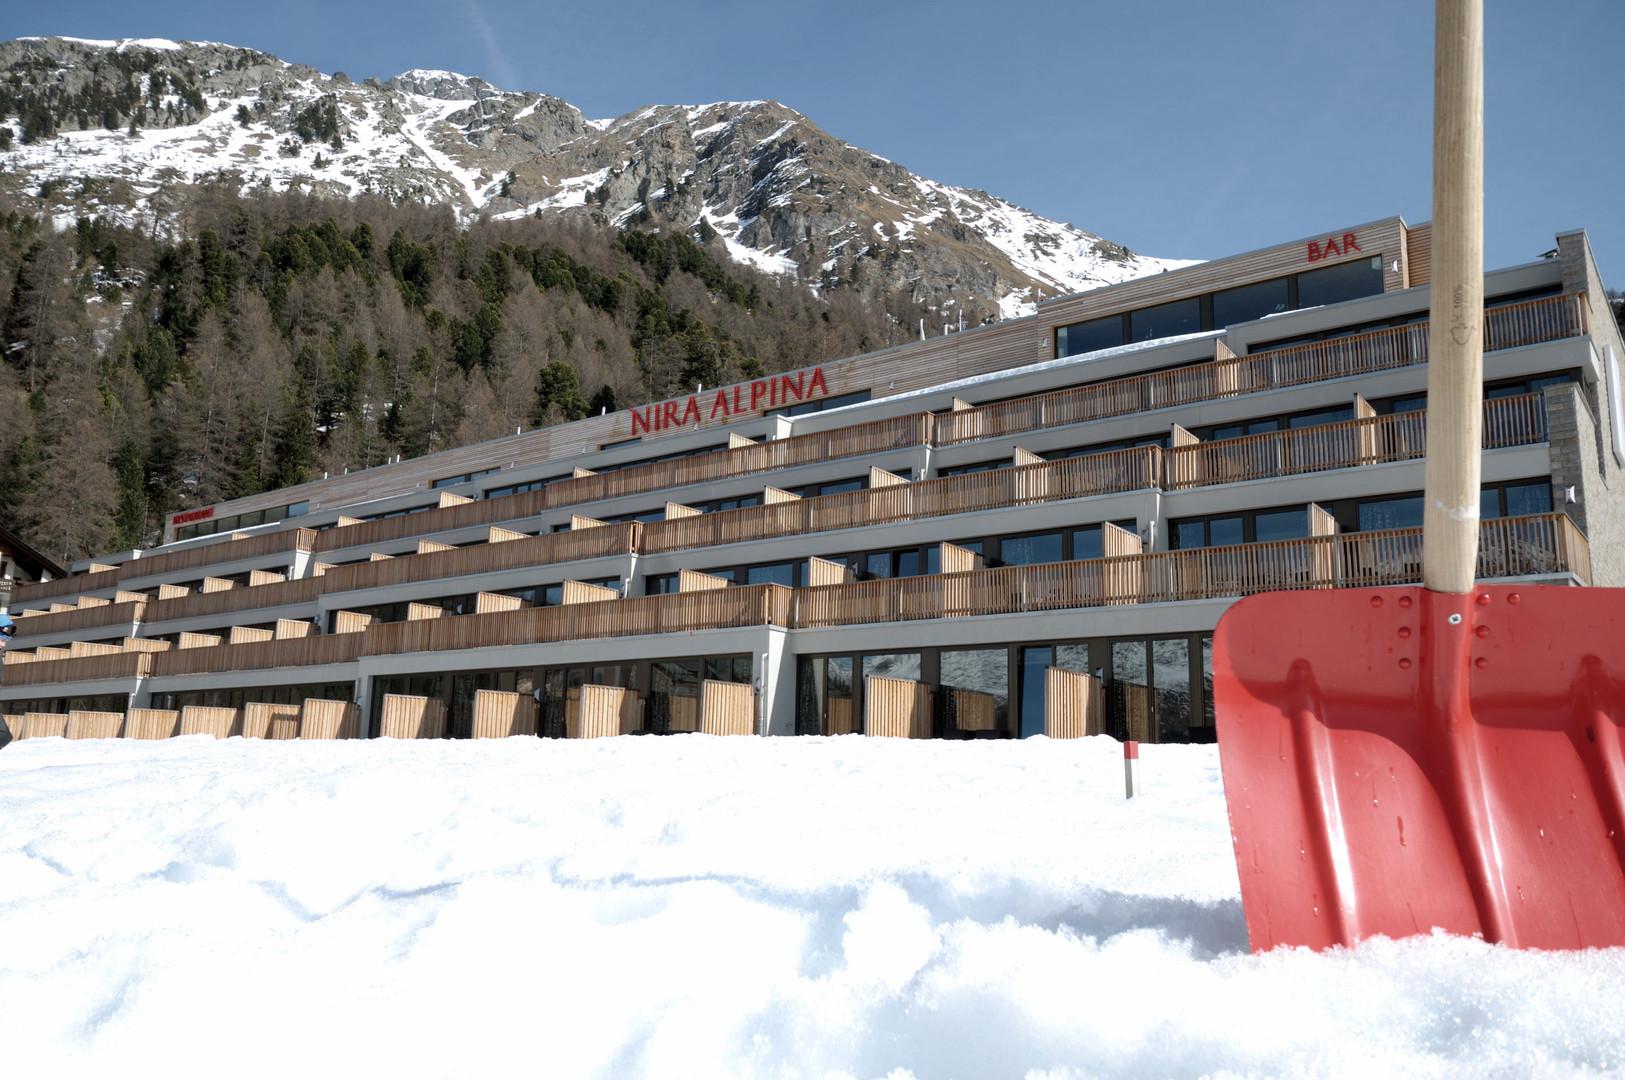 Nira Alpina Image Kampagne